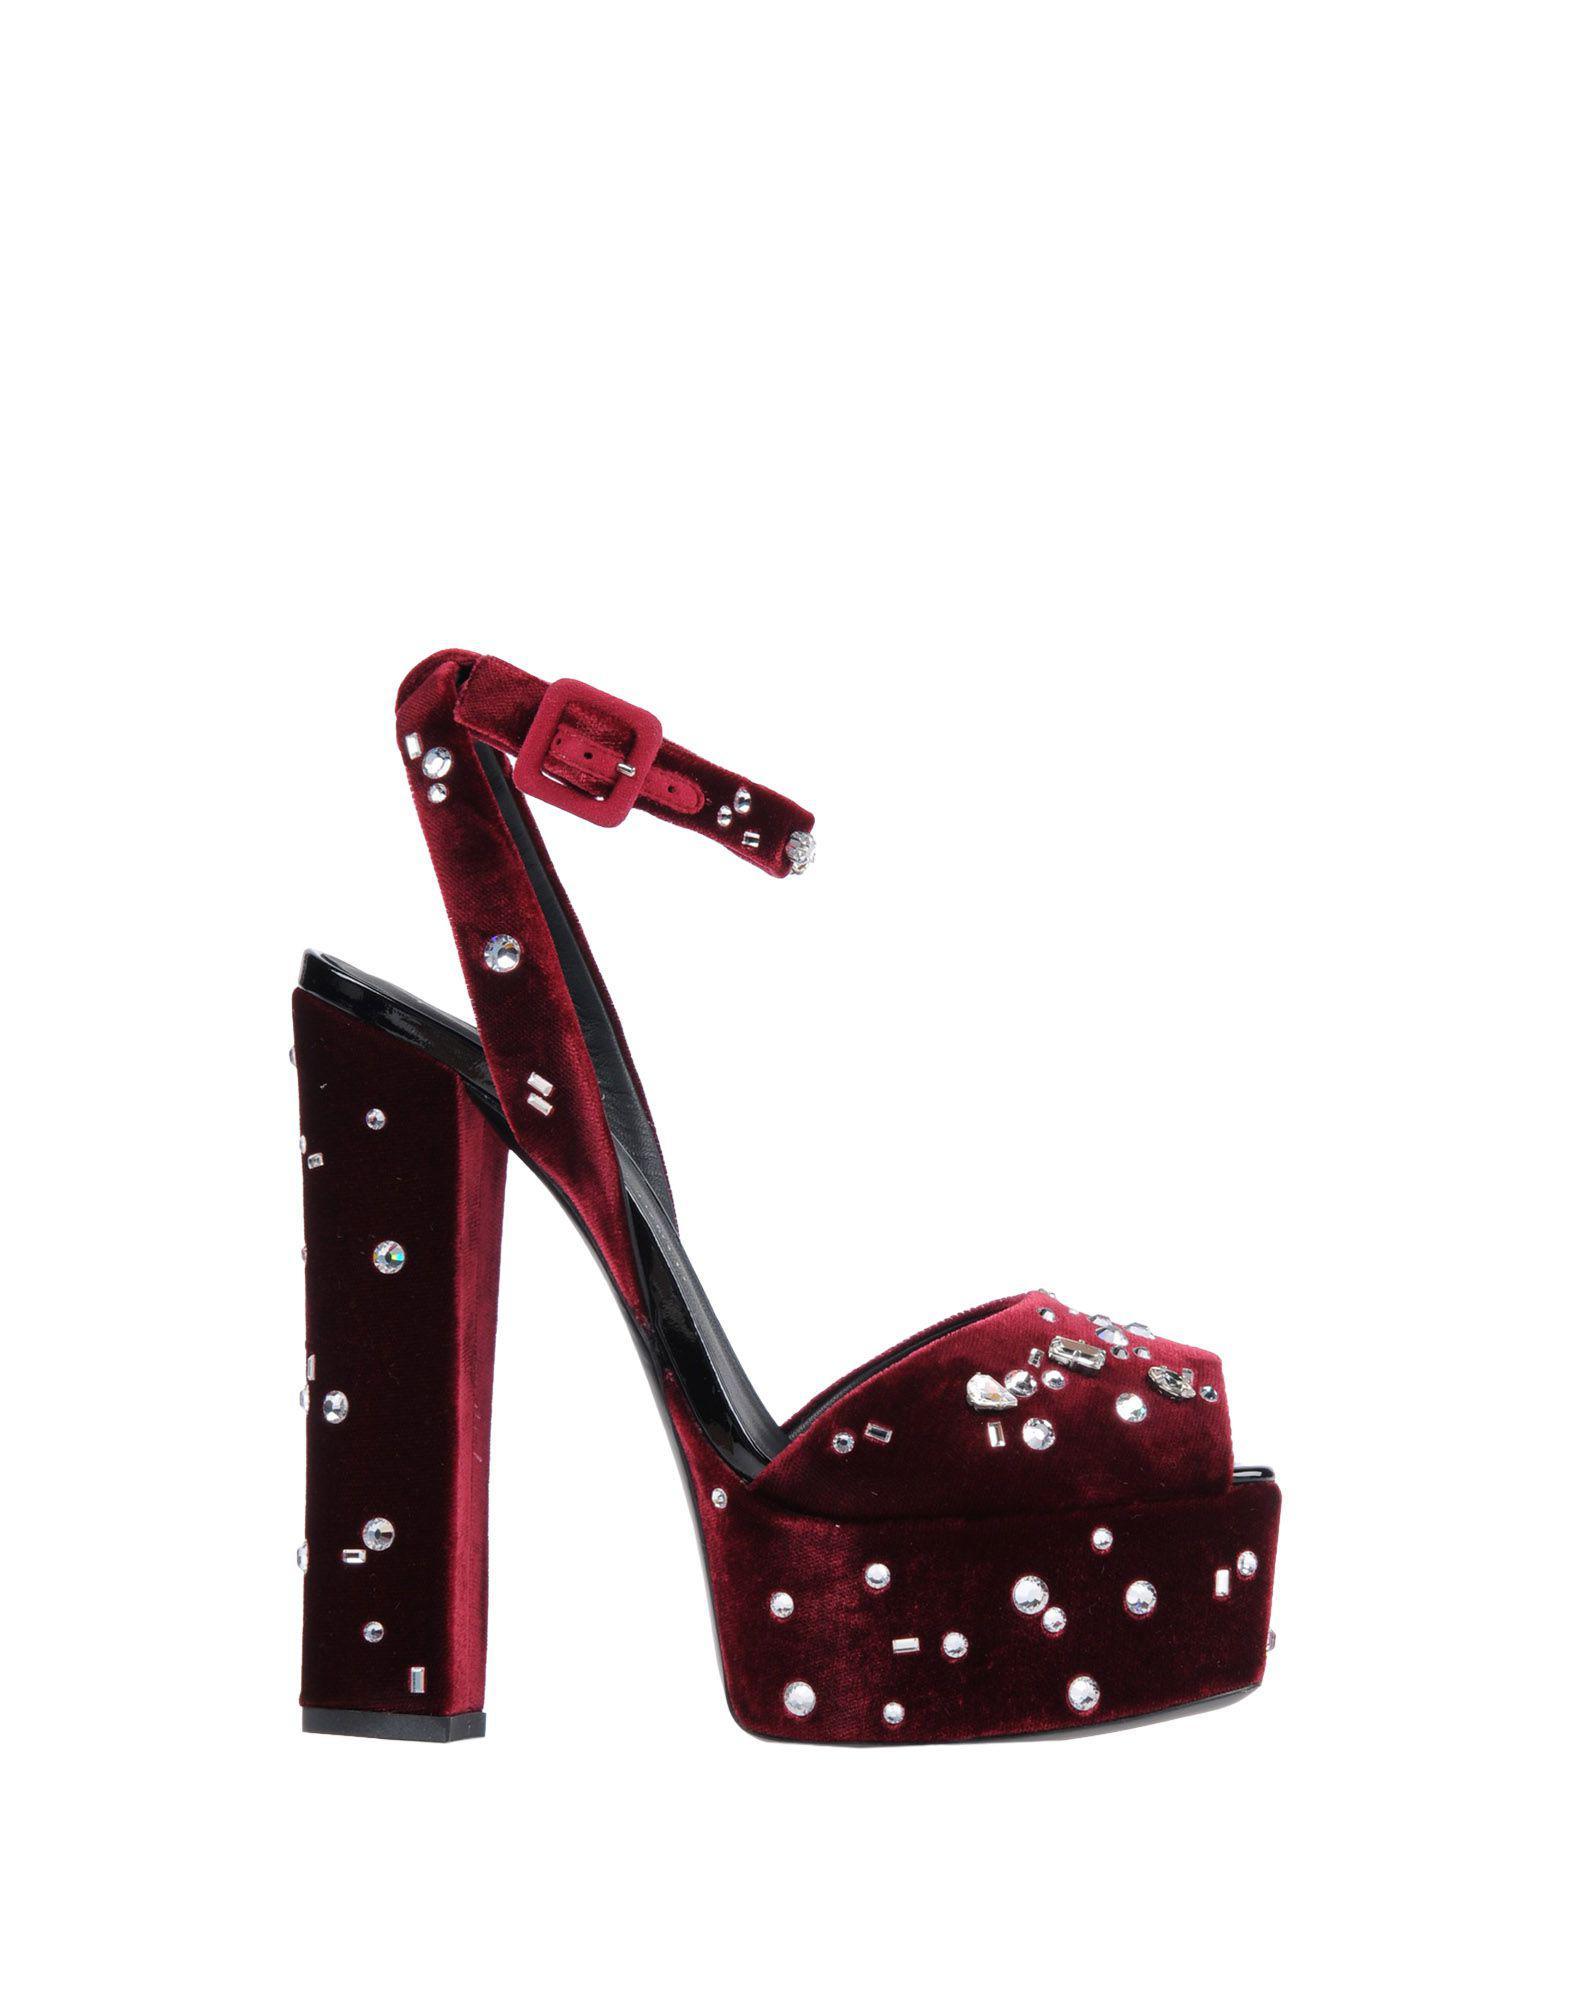 343bbdcc5d62 Lyst - Giuseppe Zanotti Lavinia Swarovski Crystal Platform Sandals - Save  50%